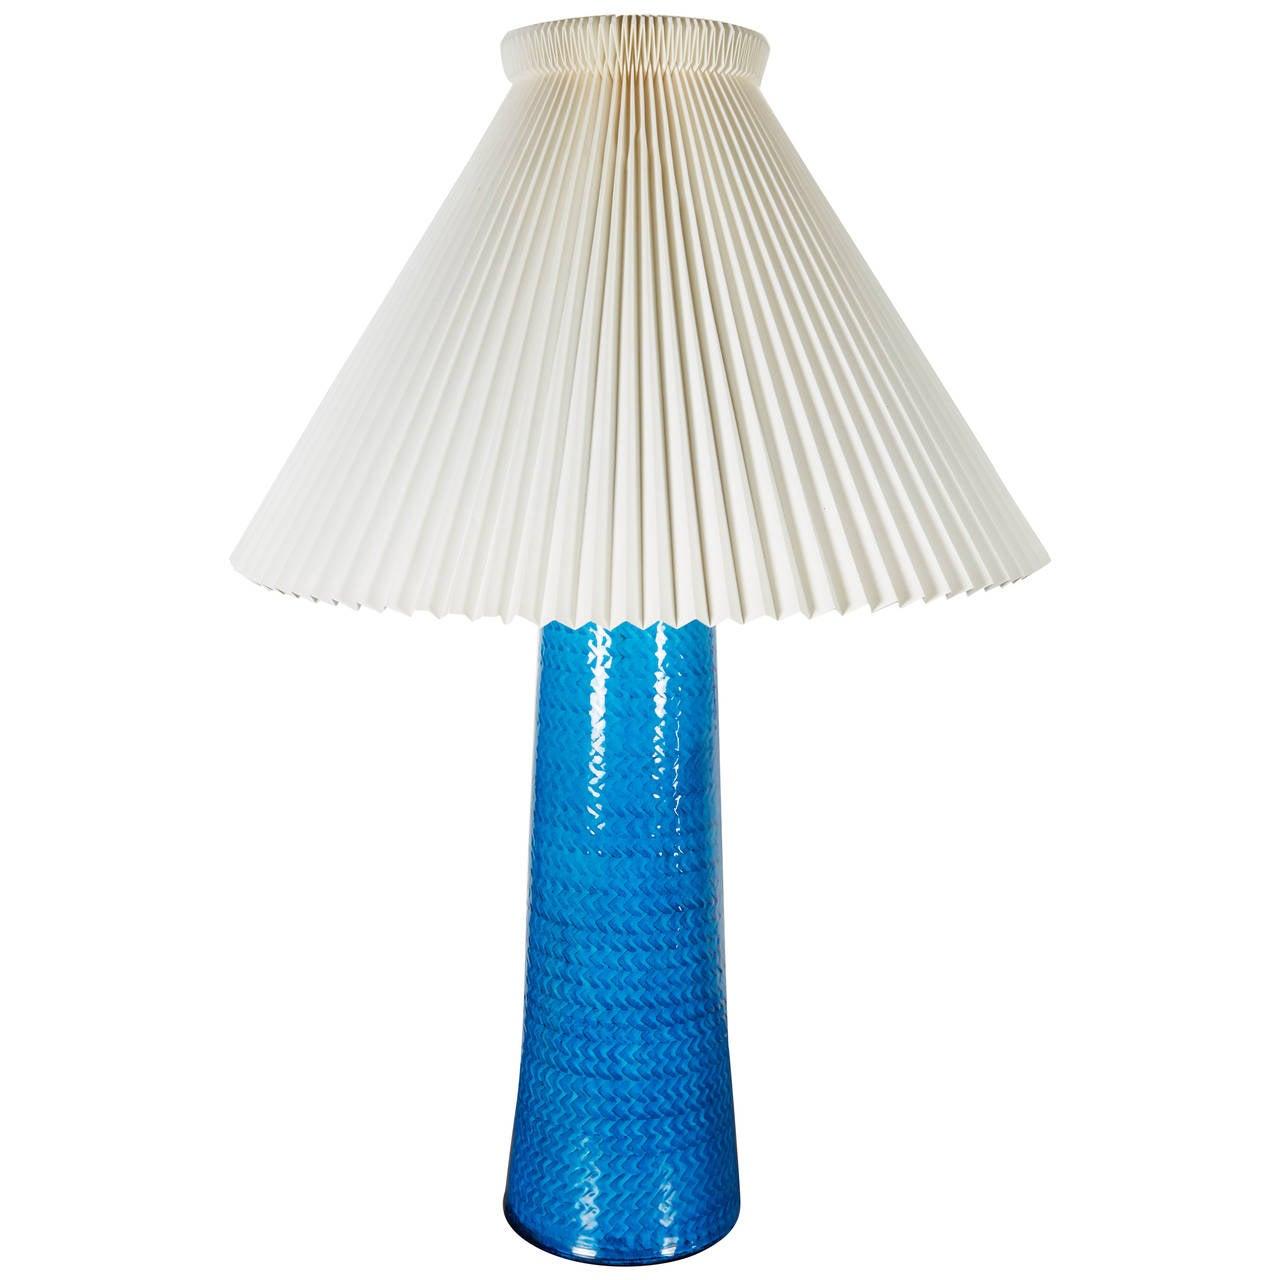 Blue ceramic table lamps - Nils K Hler Blue Ceramic Table Lamp 1